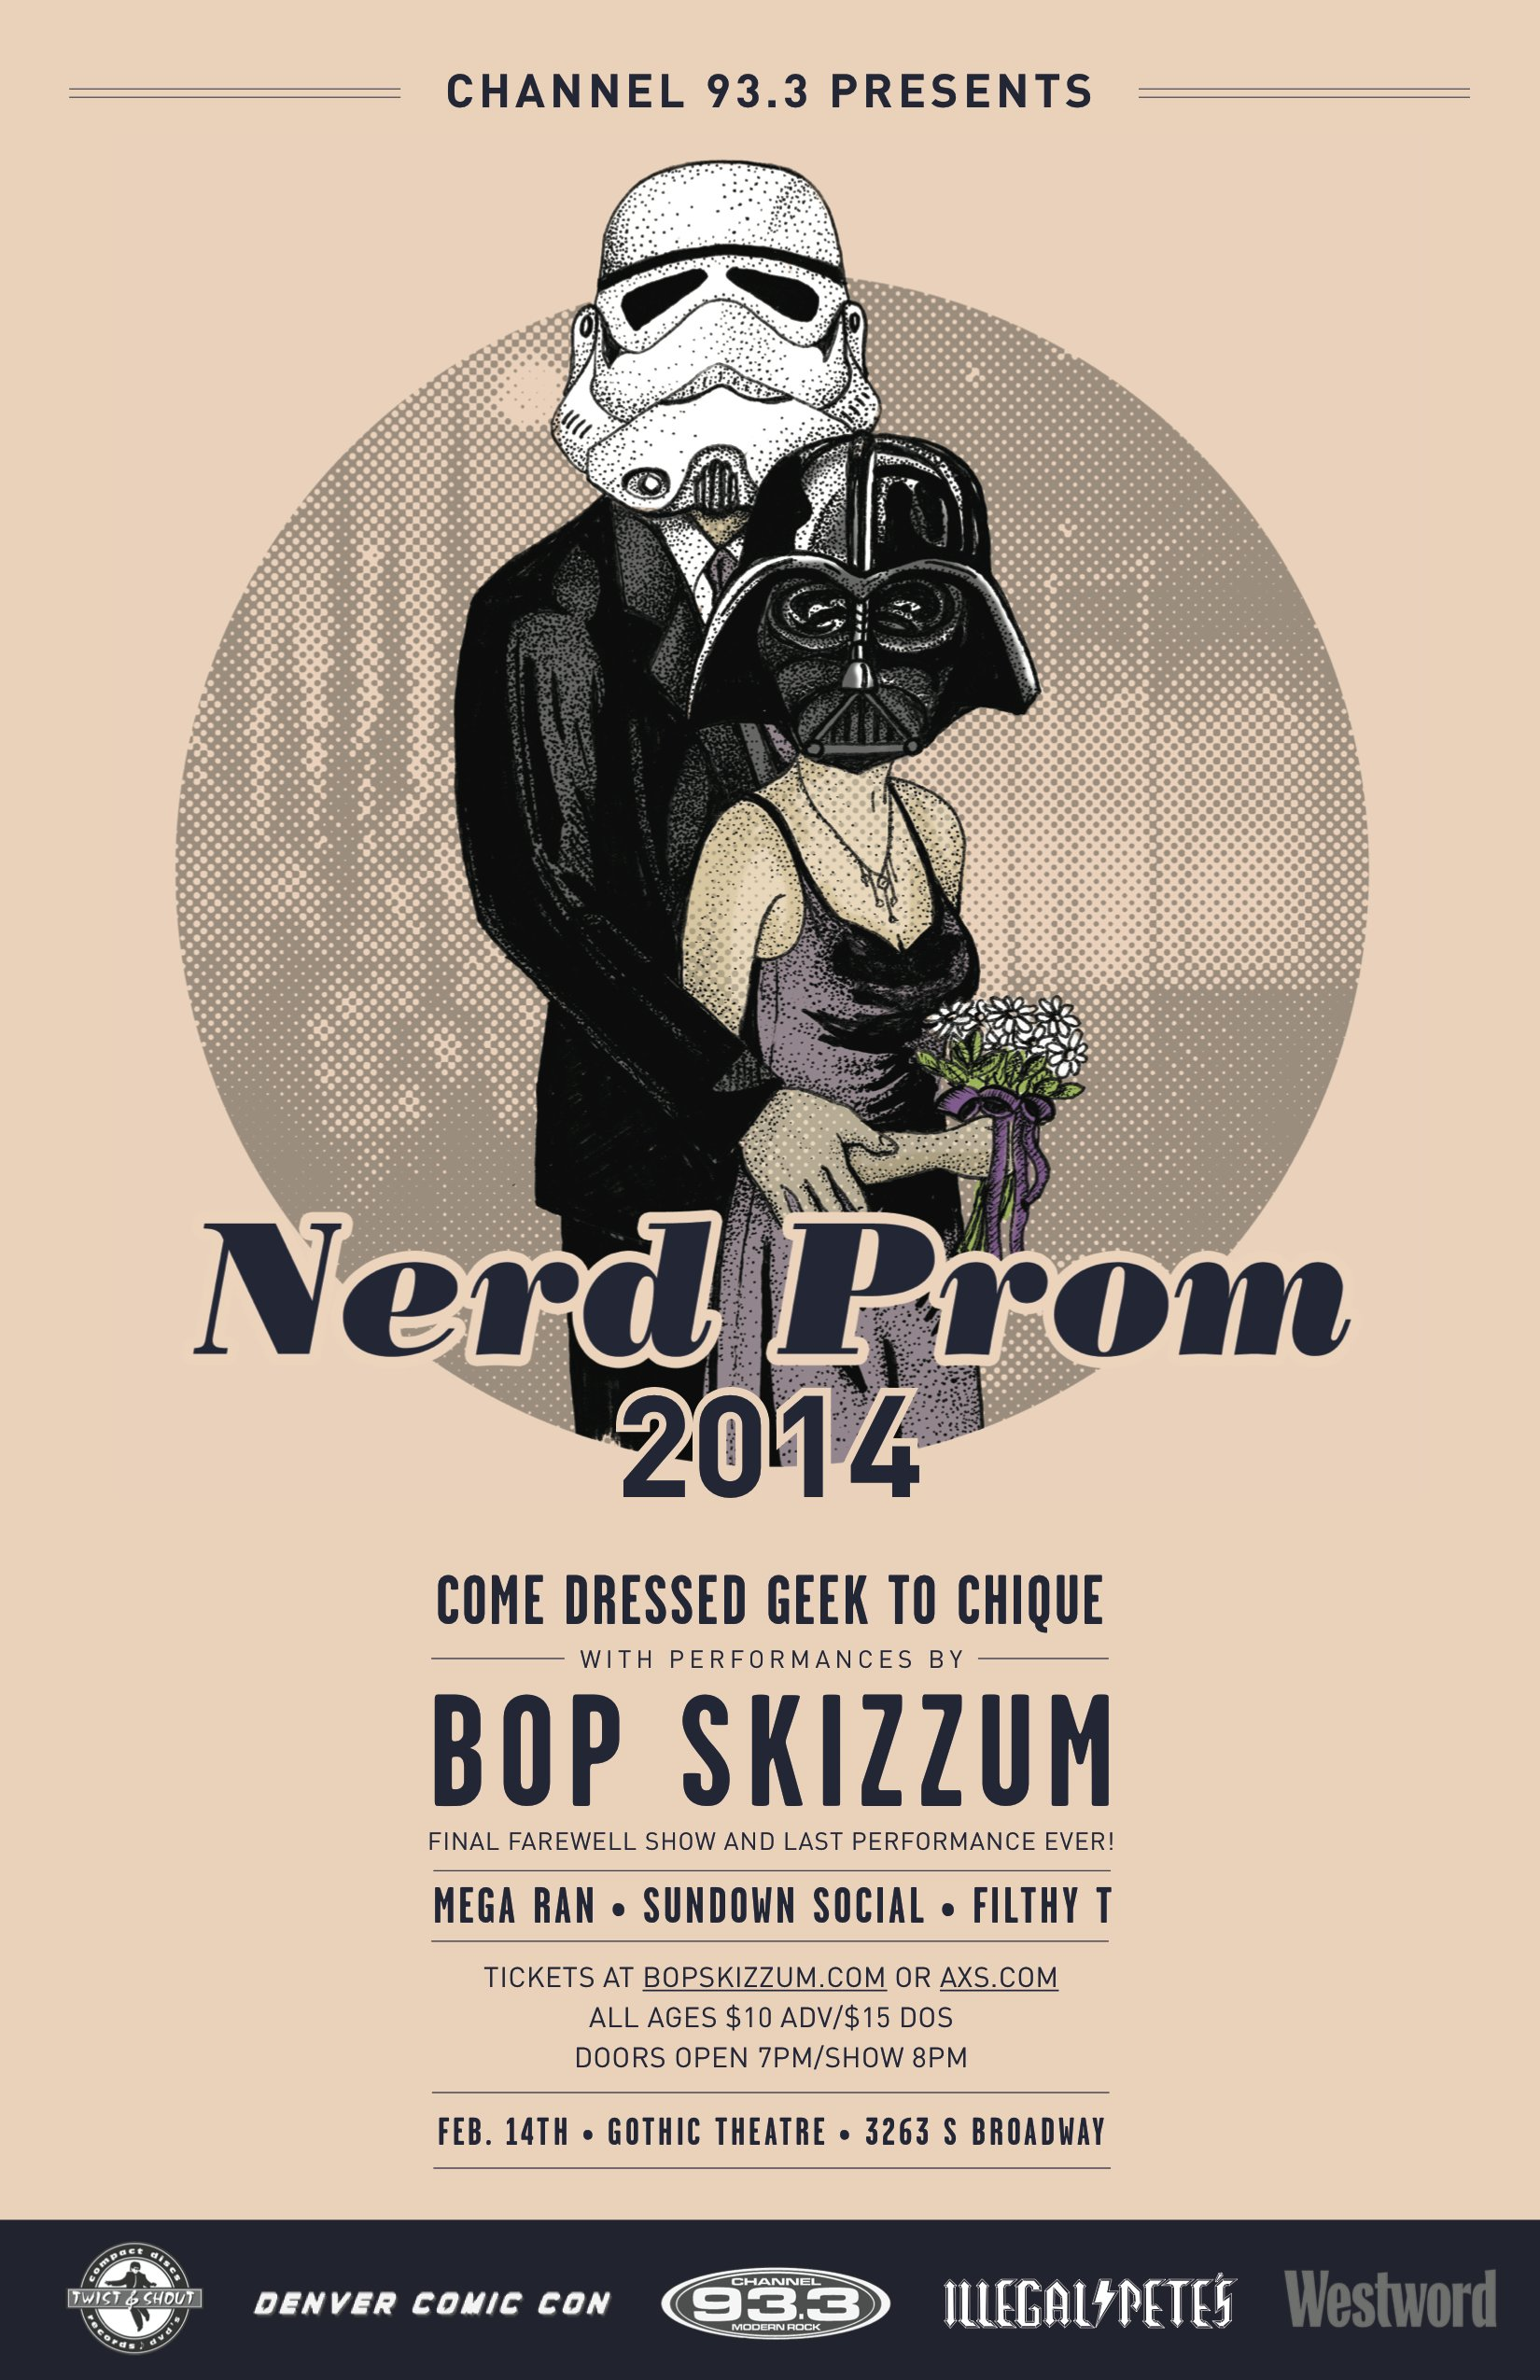 NerdProm Poster_fnl.jpeg